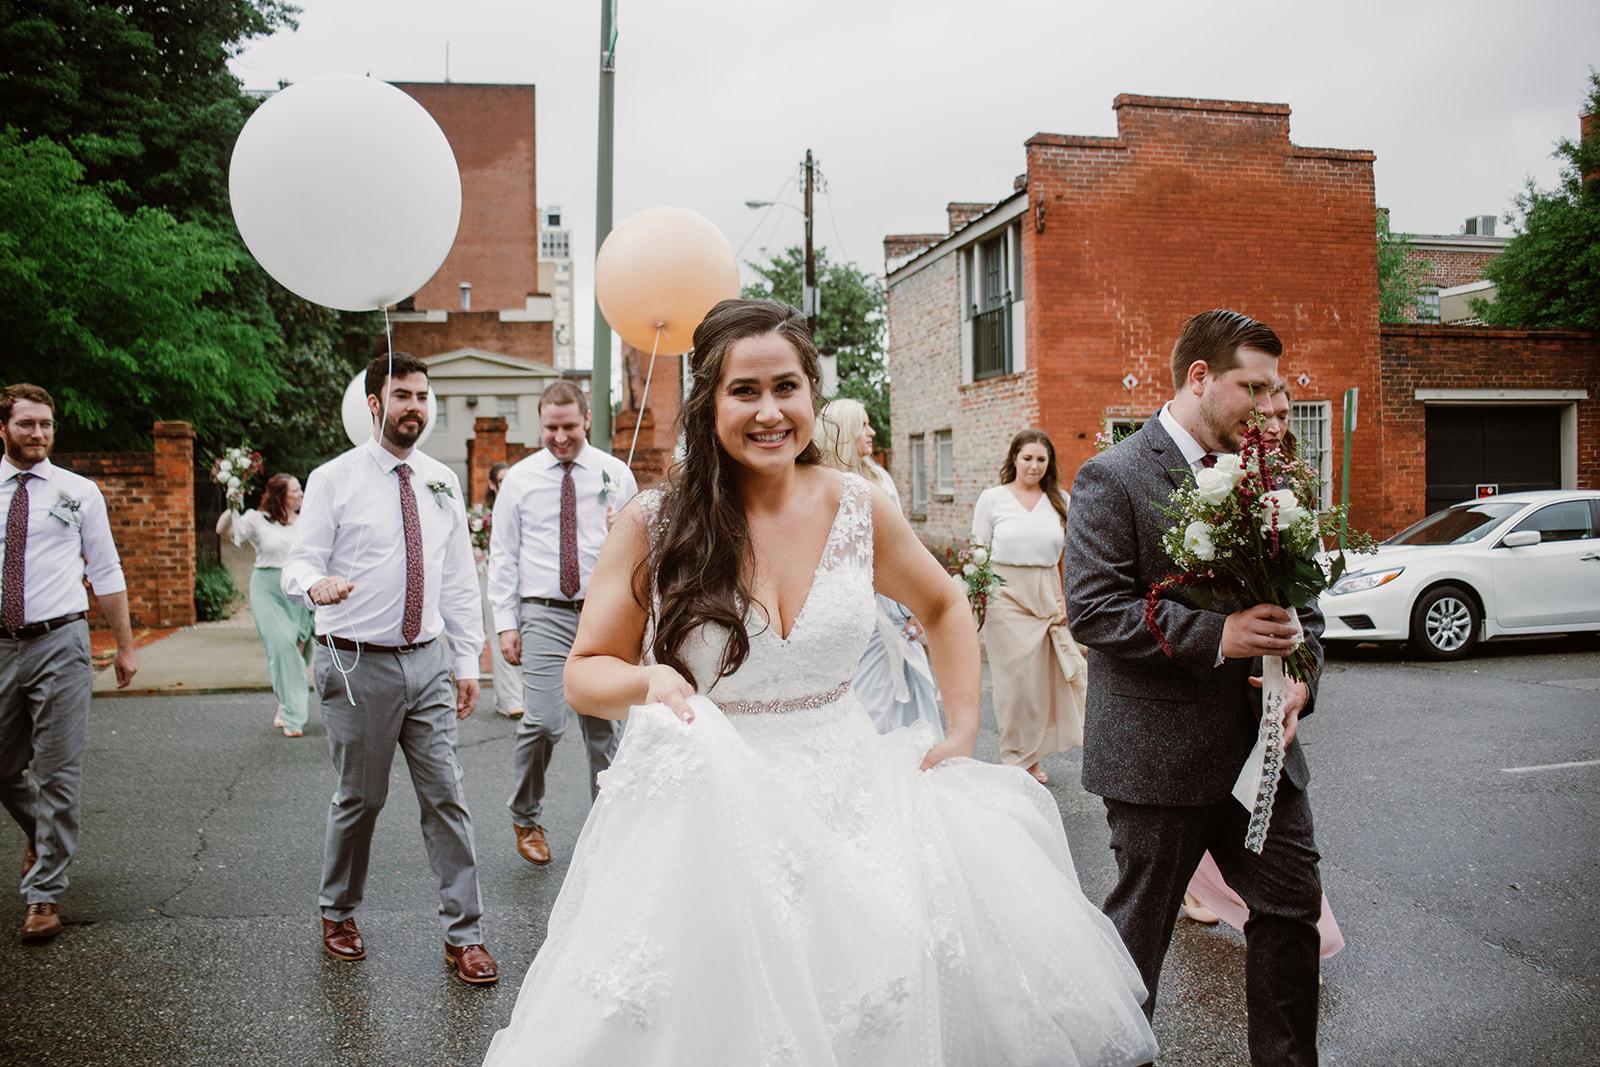 SarahMattozziPhotography-EmilyColin-LindenRowInnWedding-WeddingParty-21.jpg